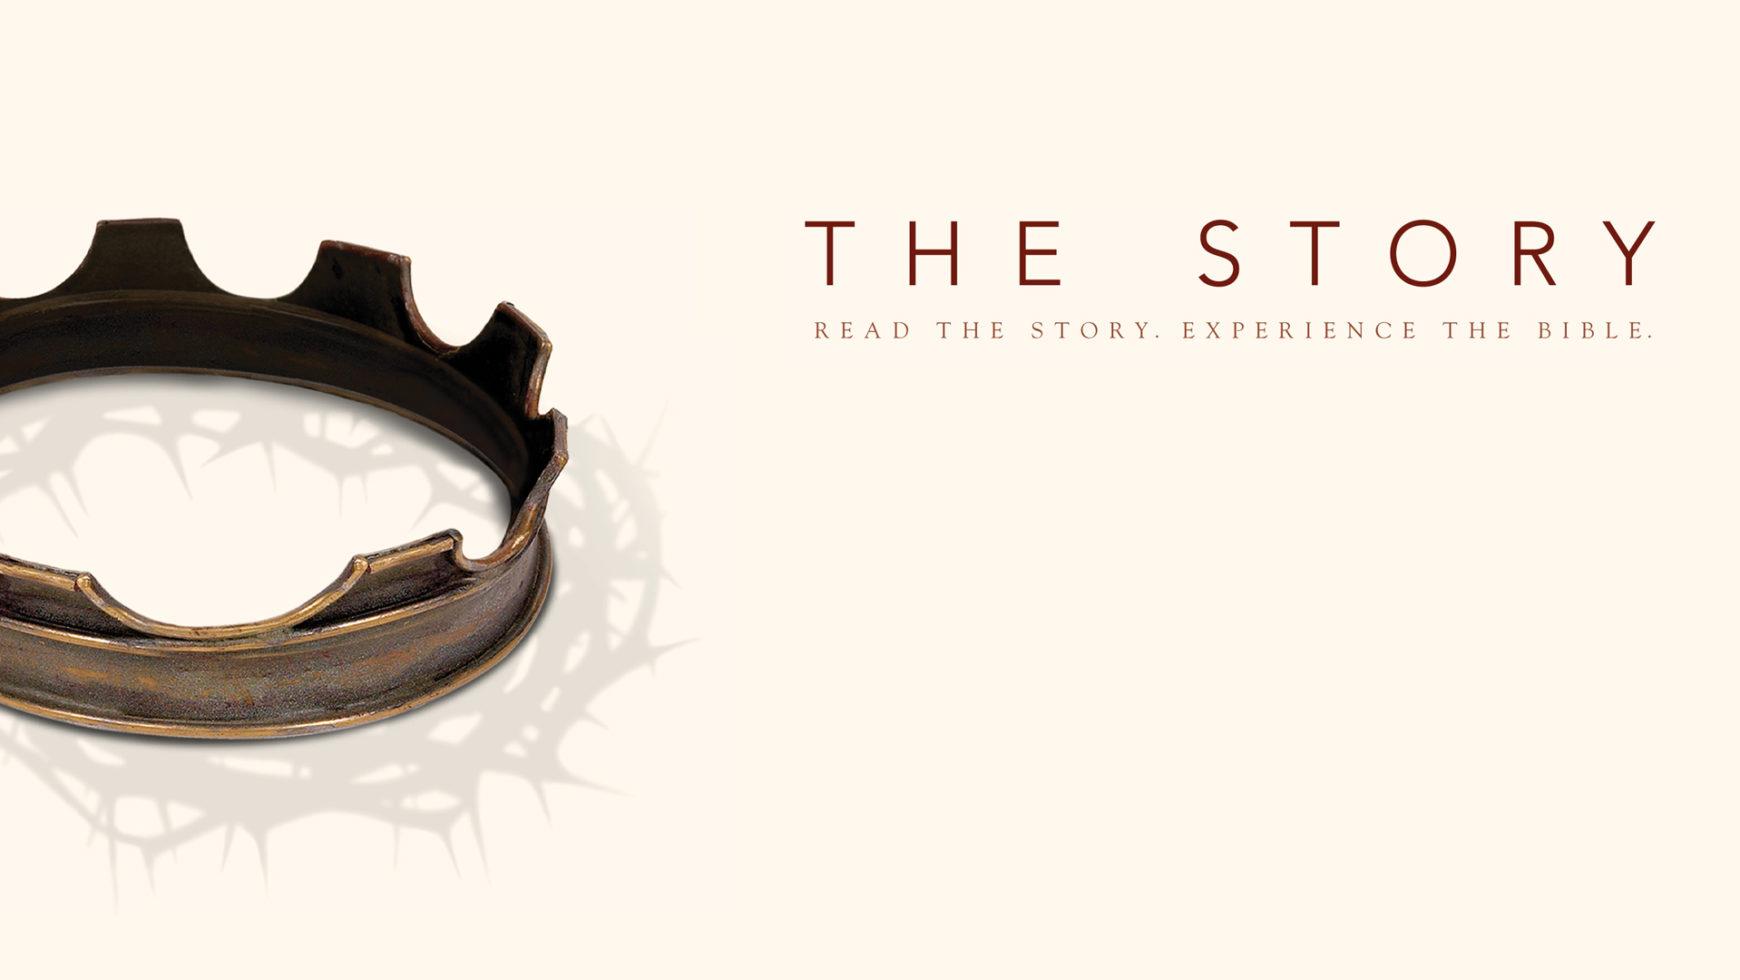 The Story (Intertestamental)